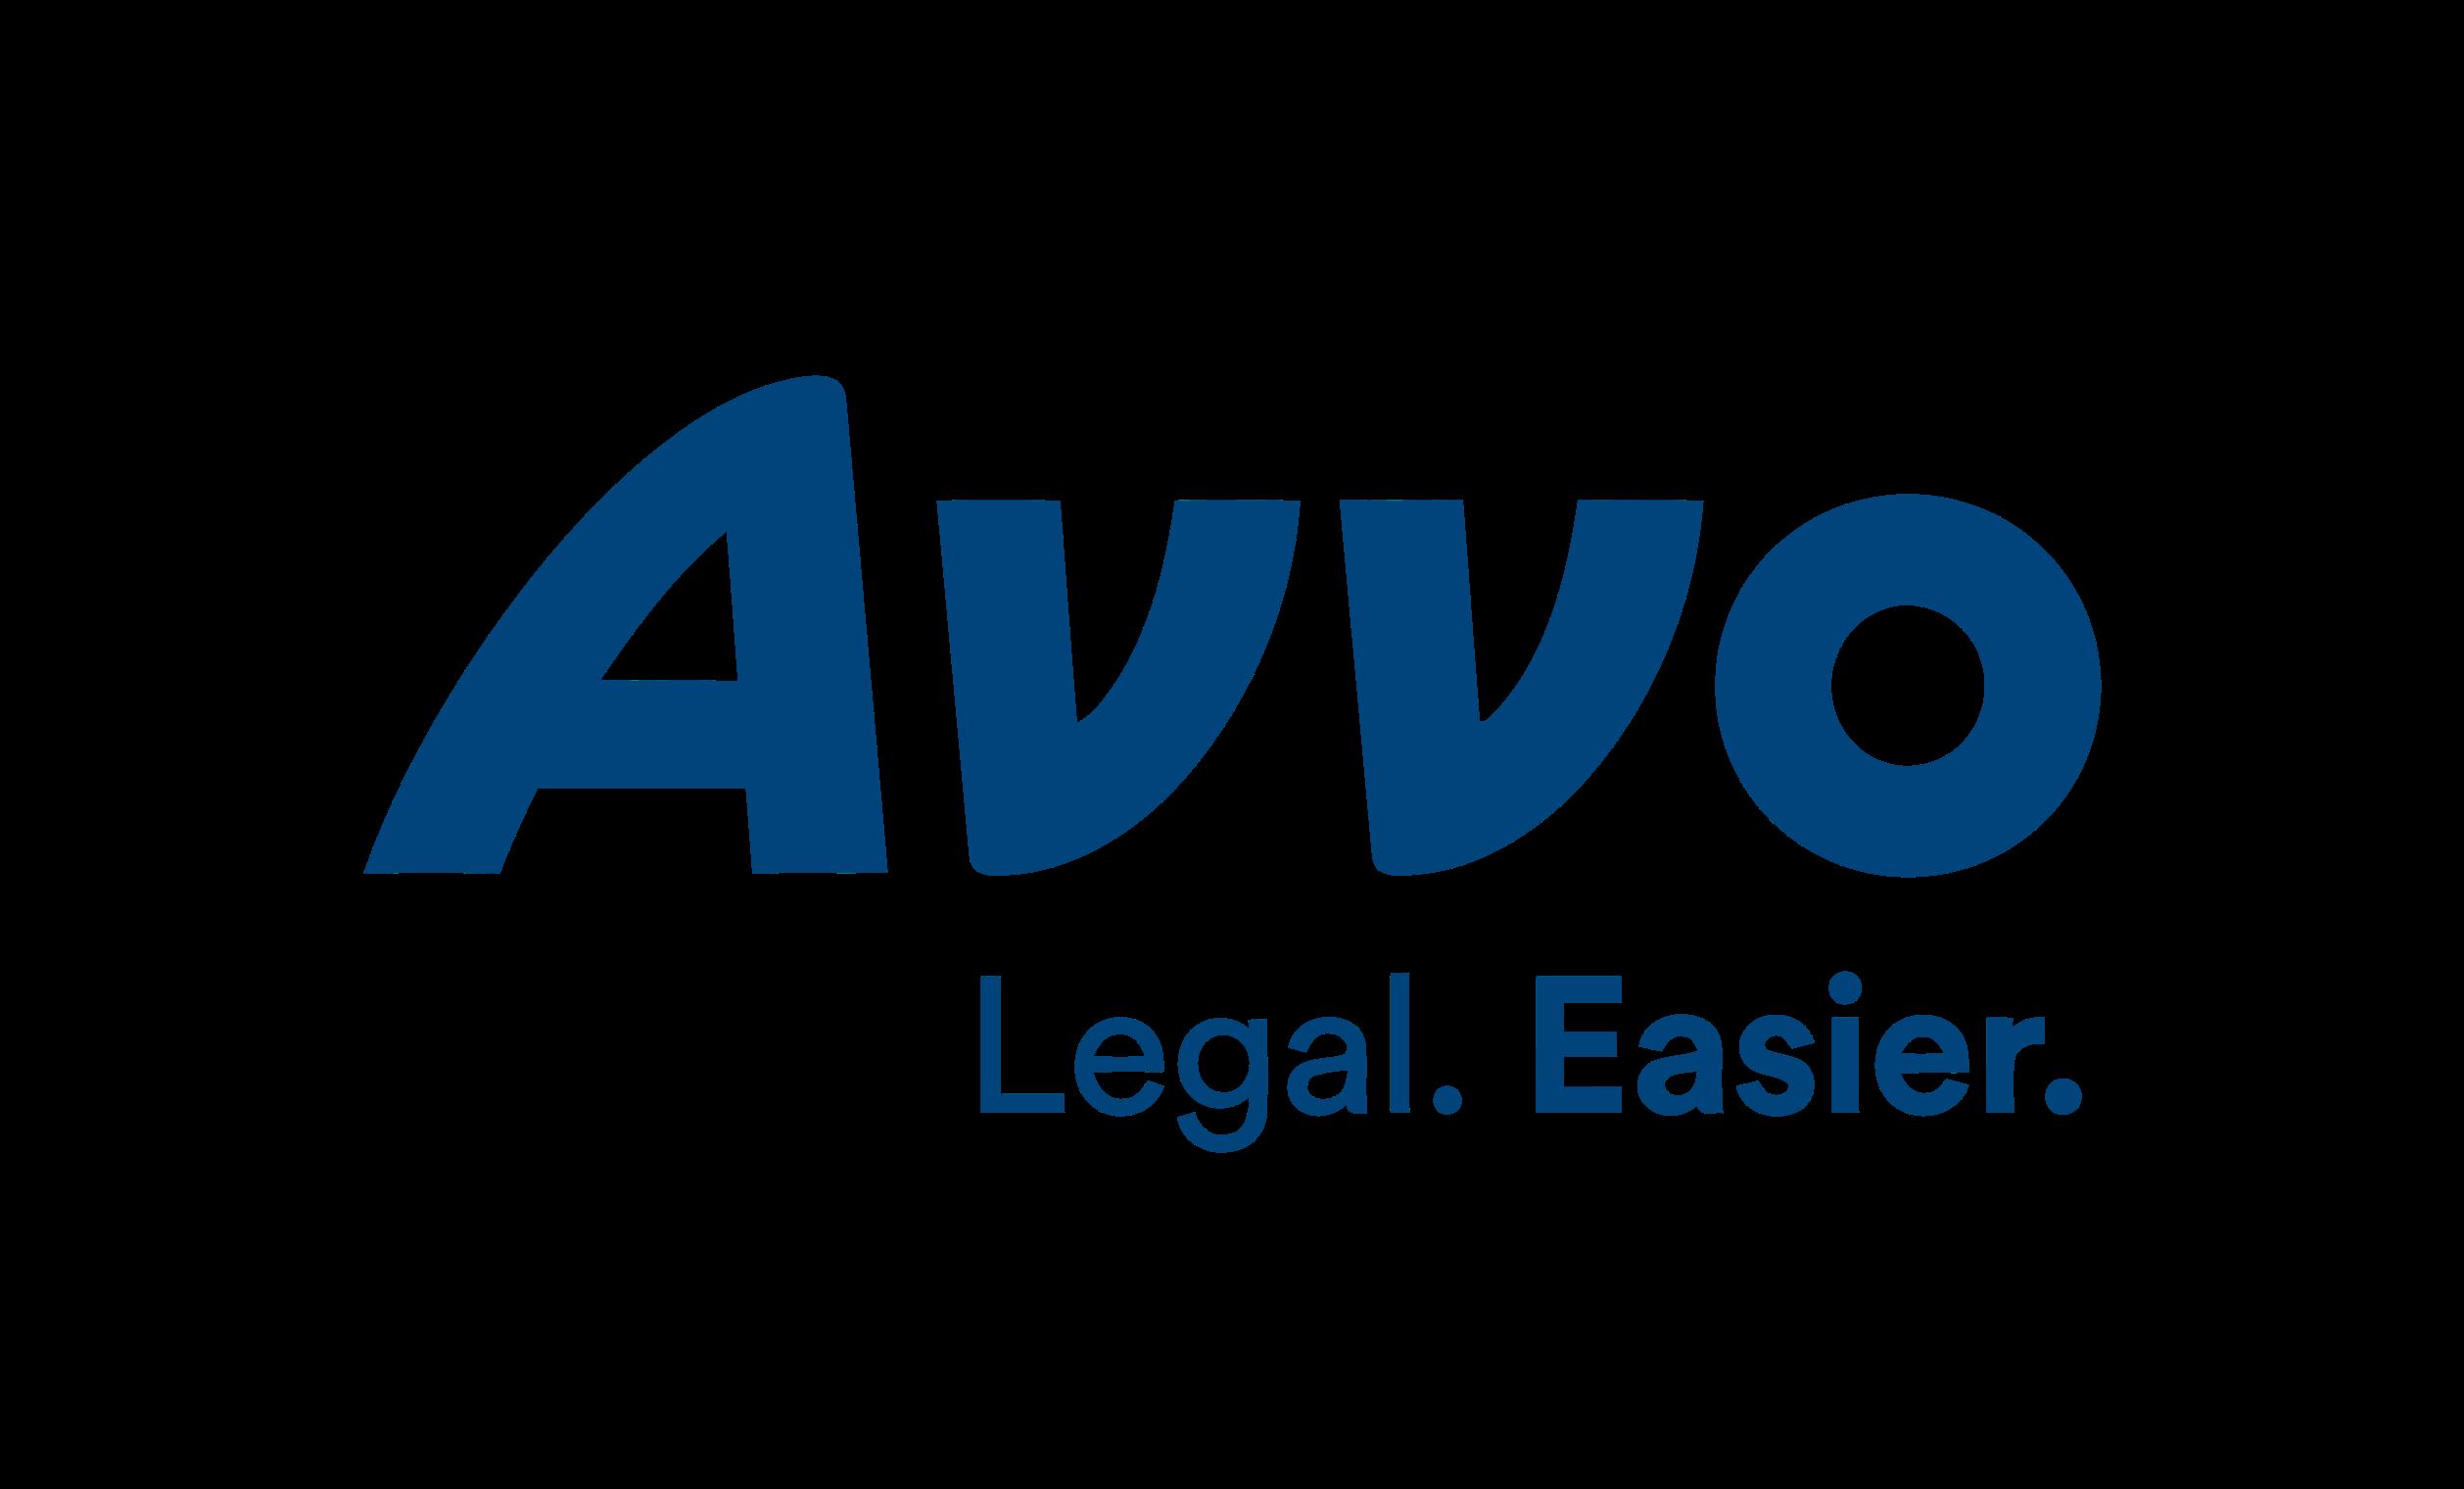 Avvo_logo_Navy_tagline_vectorized.png